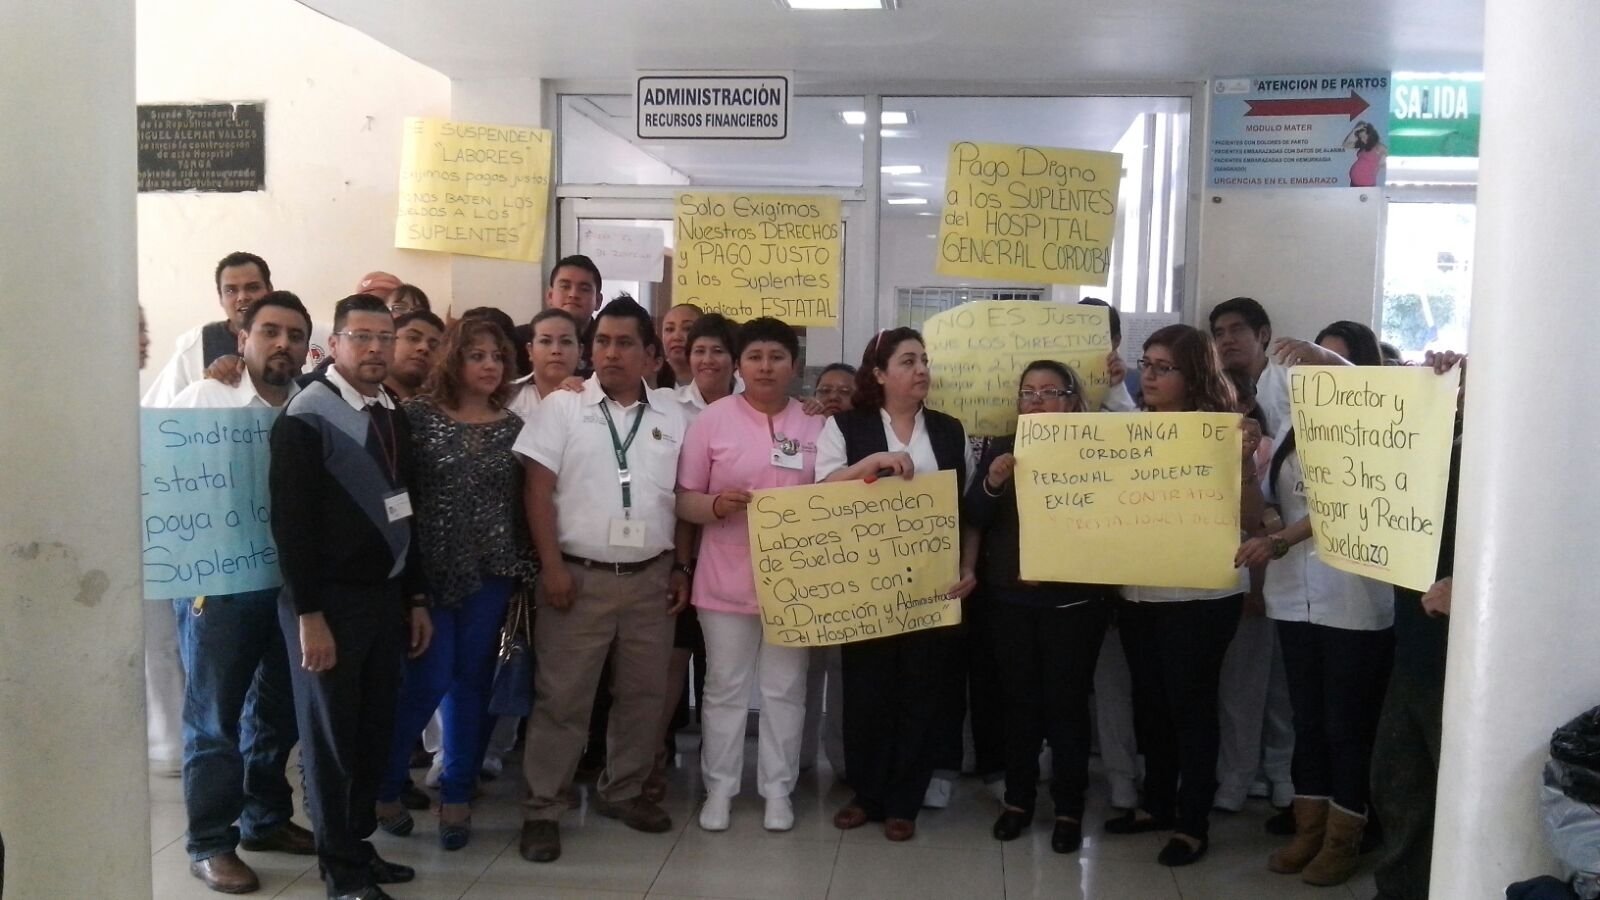 Trabajadores del Hospital General de Córdoba exigen un pago digno